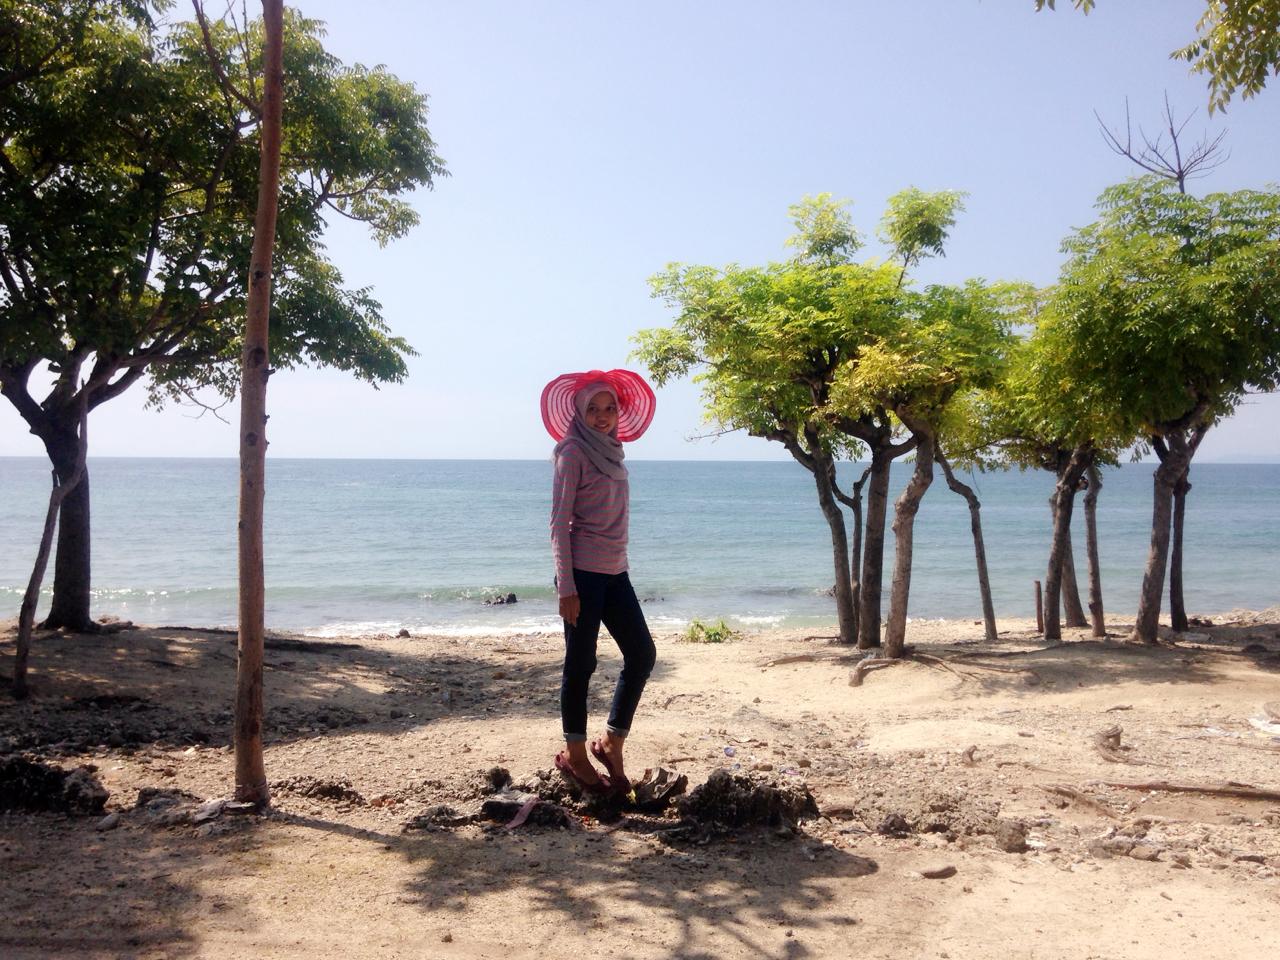 Fashion Hijab Model Baju Hijab Casual Untuk Liburan Ke Pantai